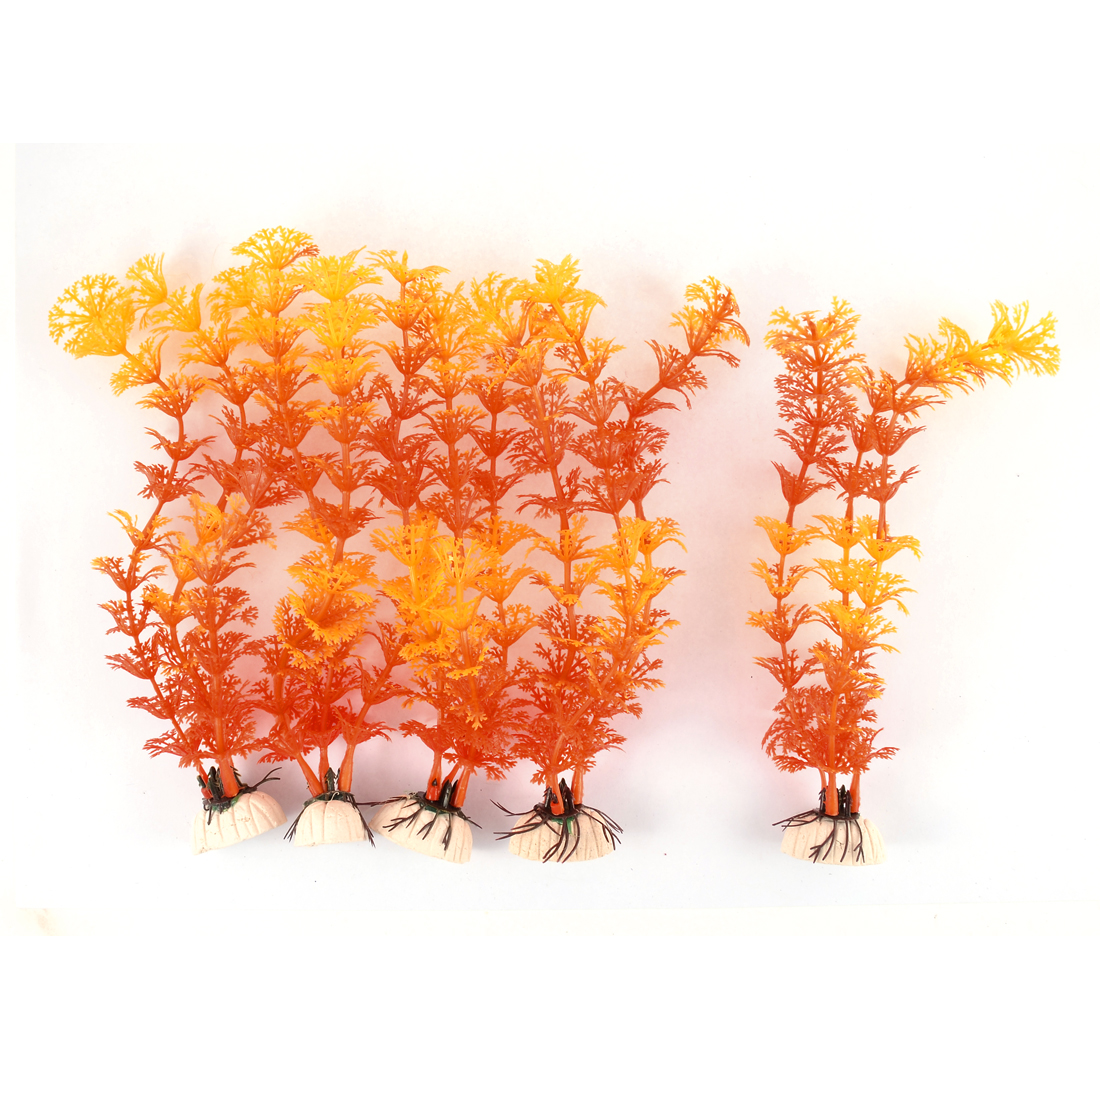 Unique Bargains Fish Tank Aquarium Plastic Leaf Water Grass Plants Decoration Orange Yellow 5PCS